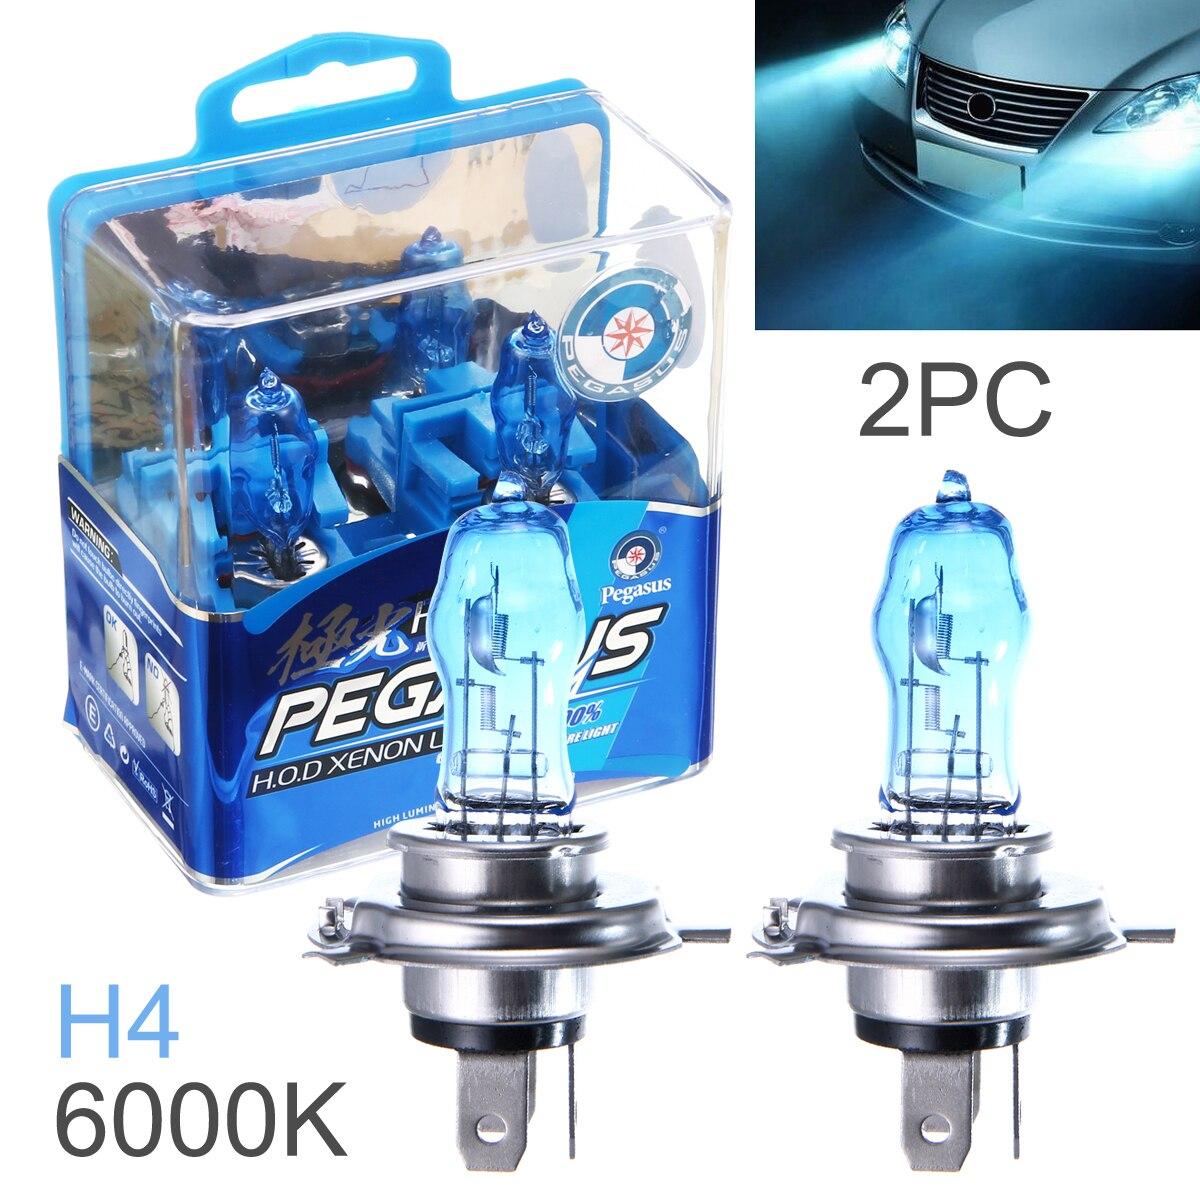 2 X H7 55W 12V 6000K Xenon Gas Halogen Headlight Day White Light Lamp Bulb New H